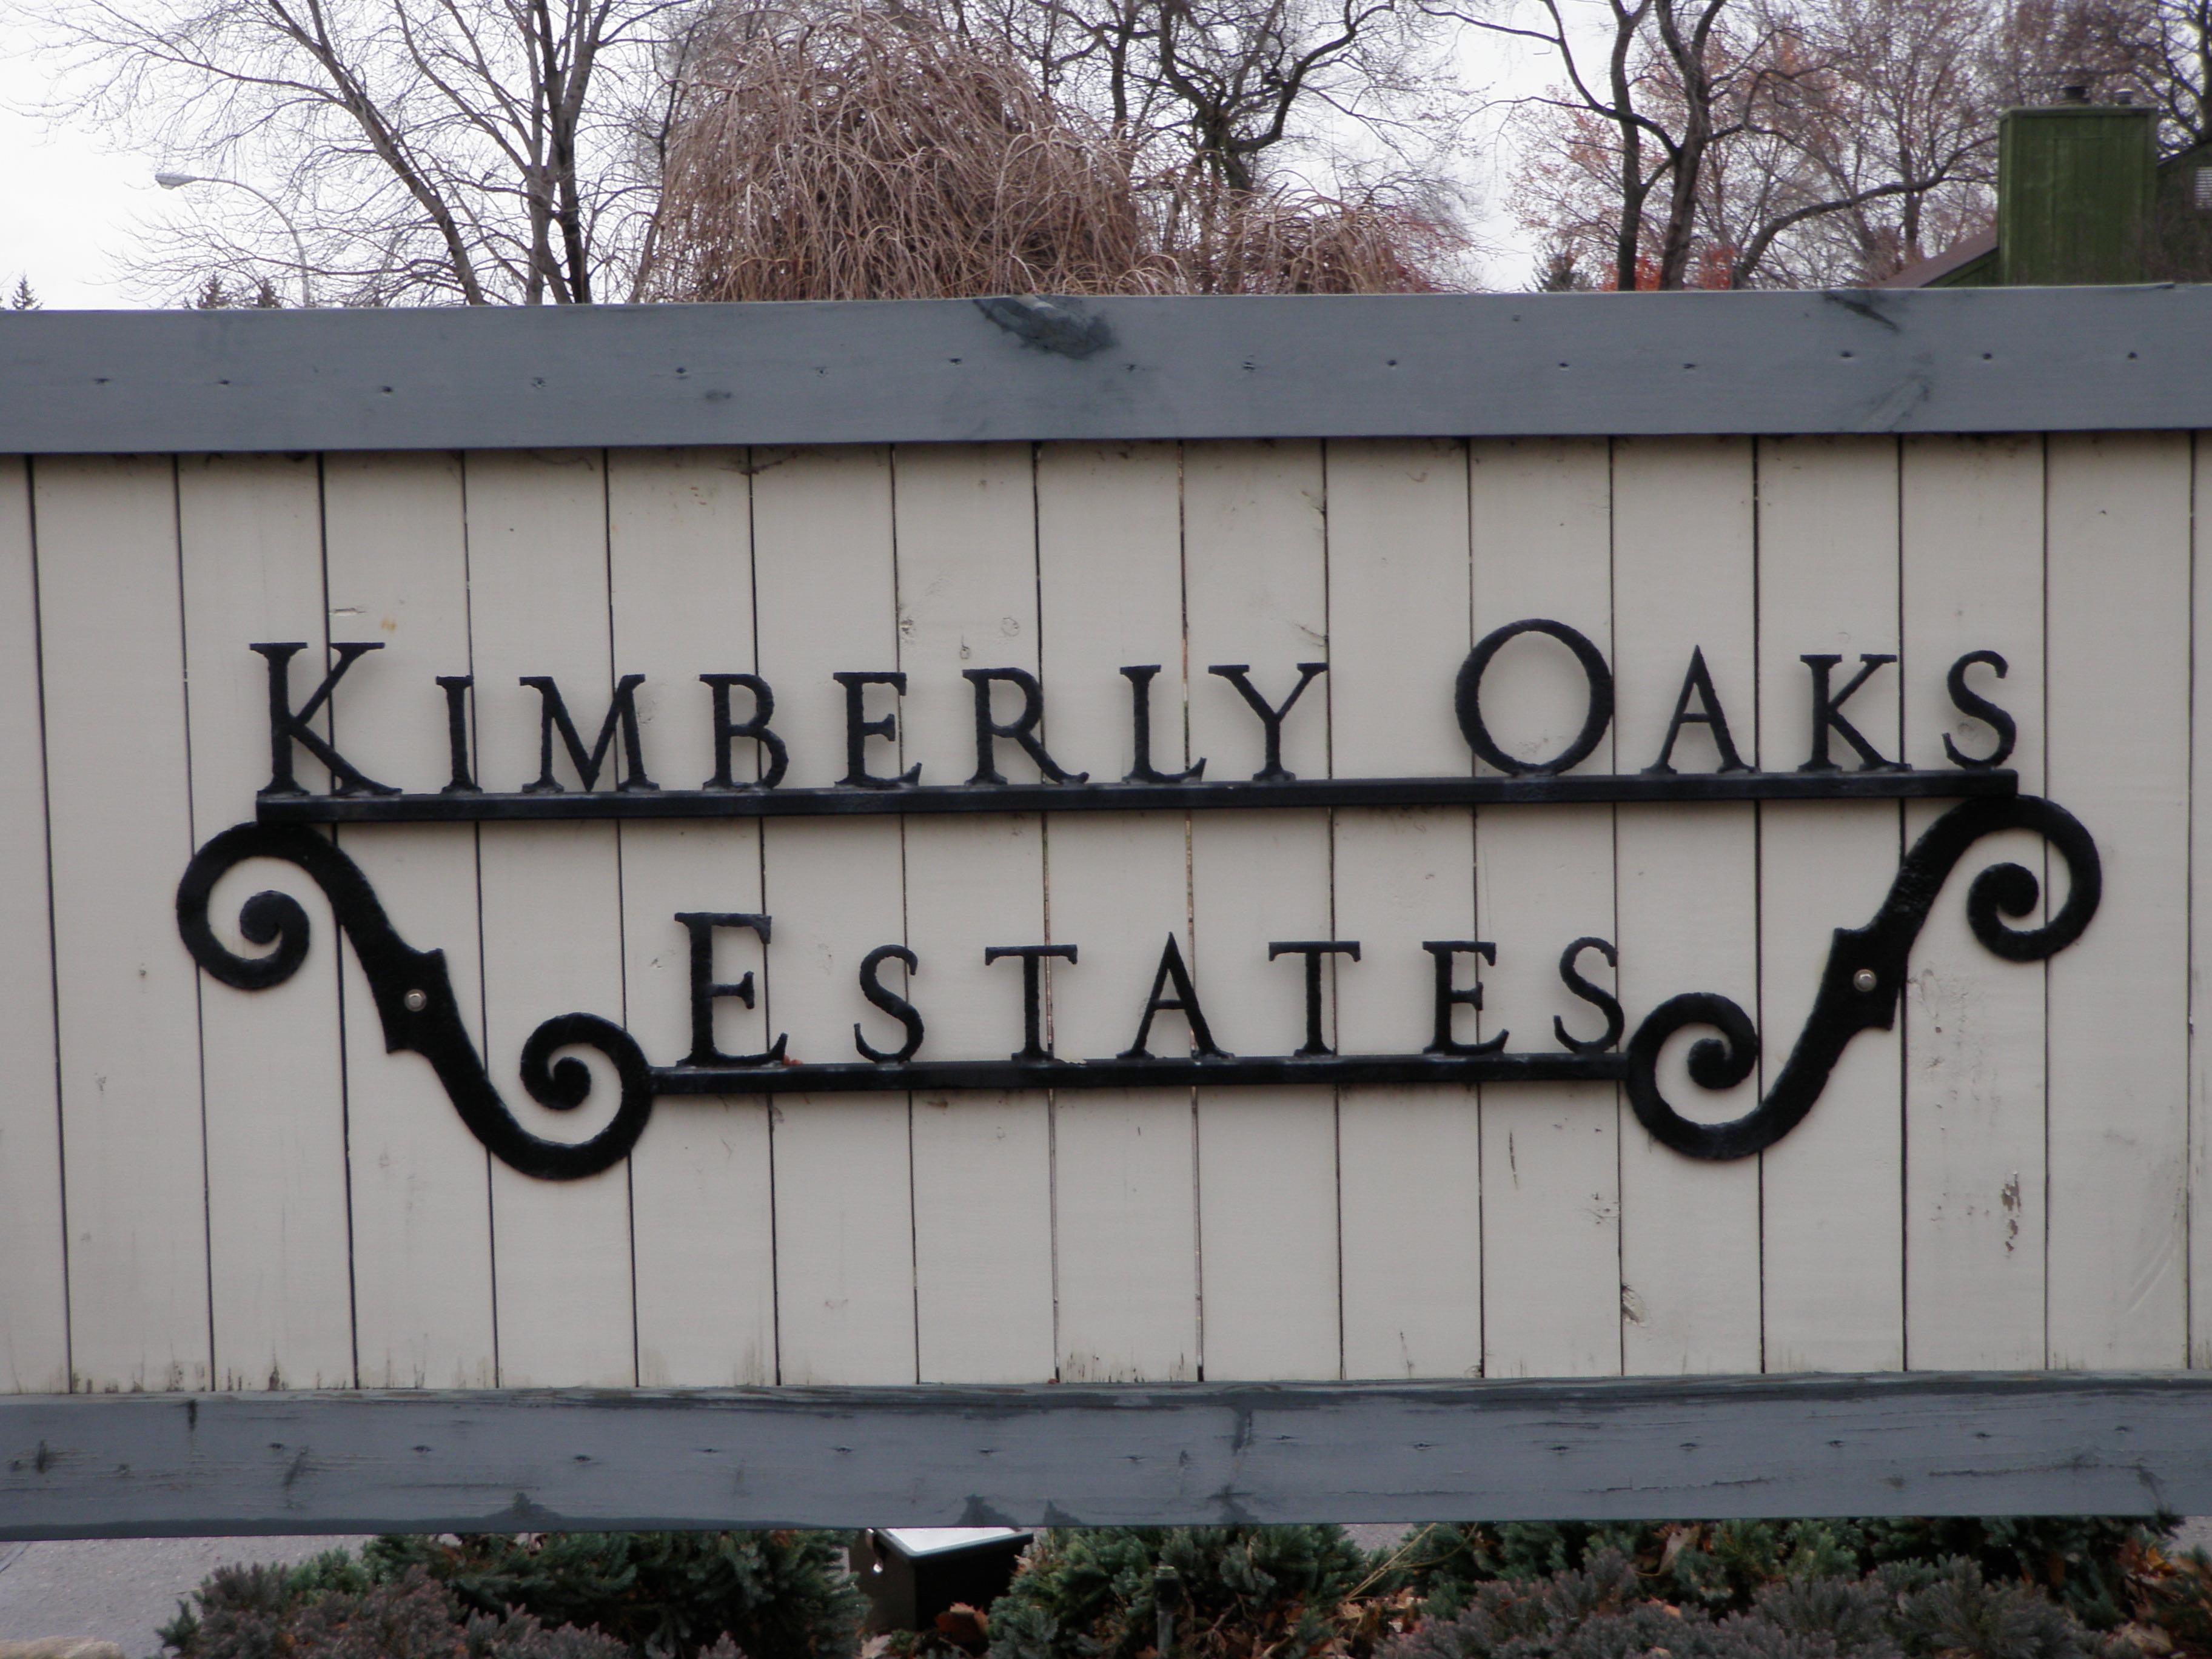 Kimberly Oaks Estates Livonia Michigan